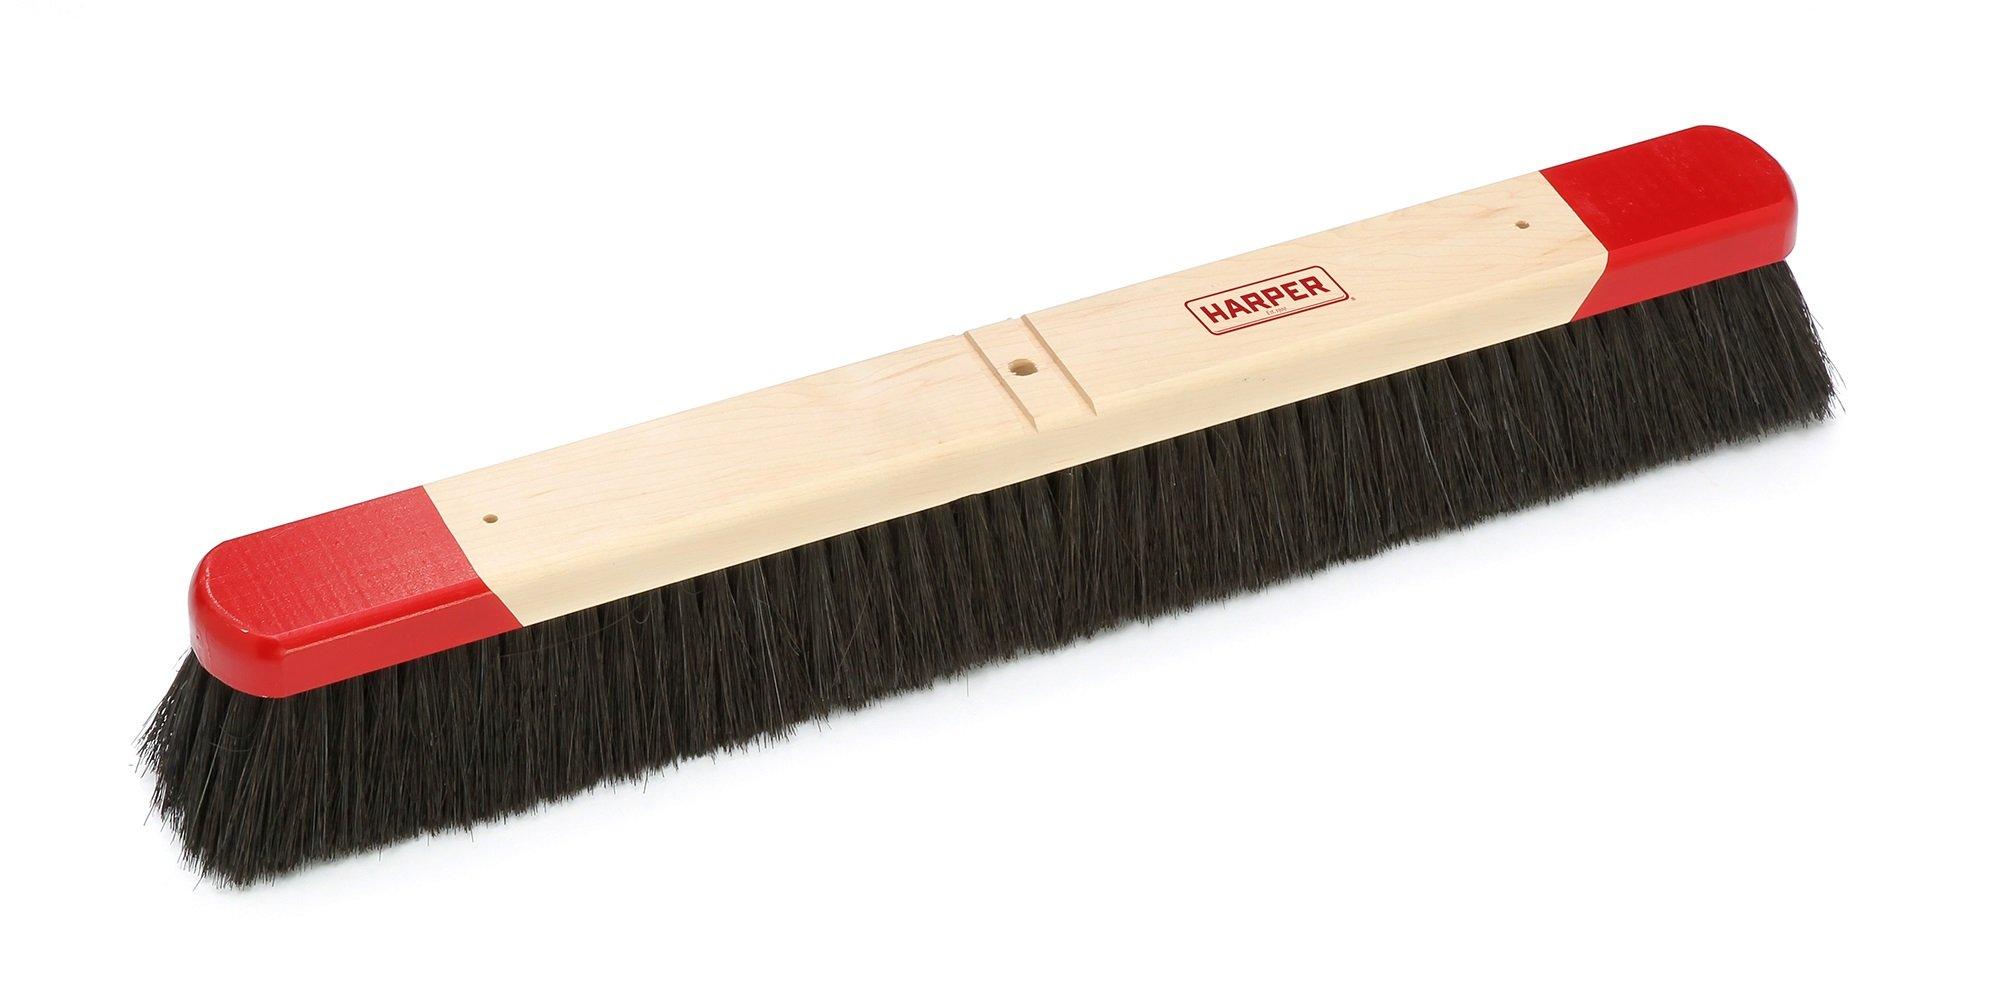 Harper Brush 322412 Broom Head, Tampico Fiber, All Purpose, Semi Rough Surface, Maple, 24'' (Pack of 6) by Harper Brush